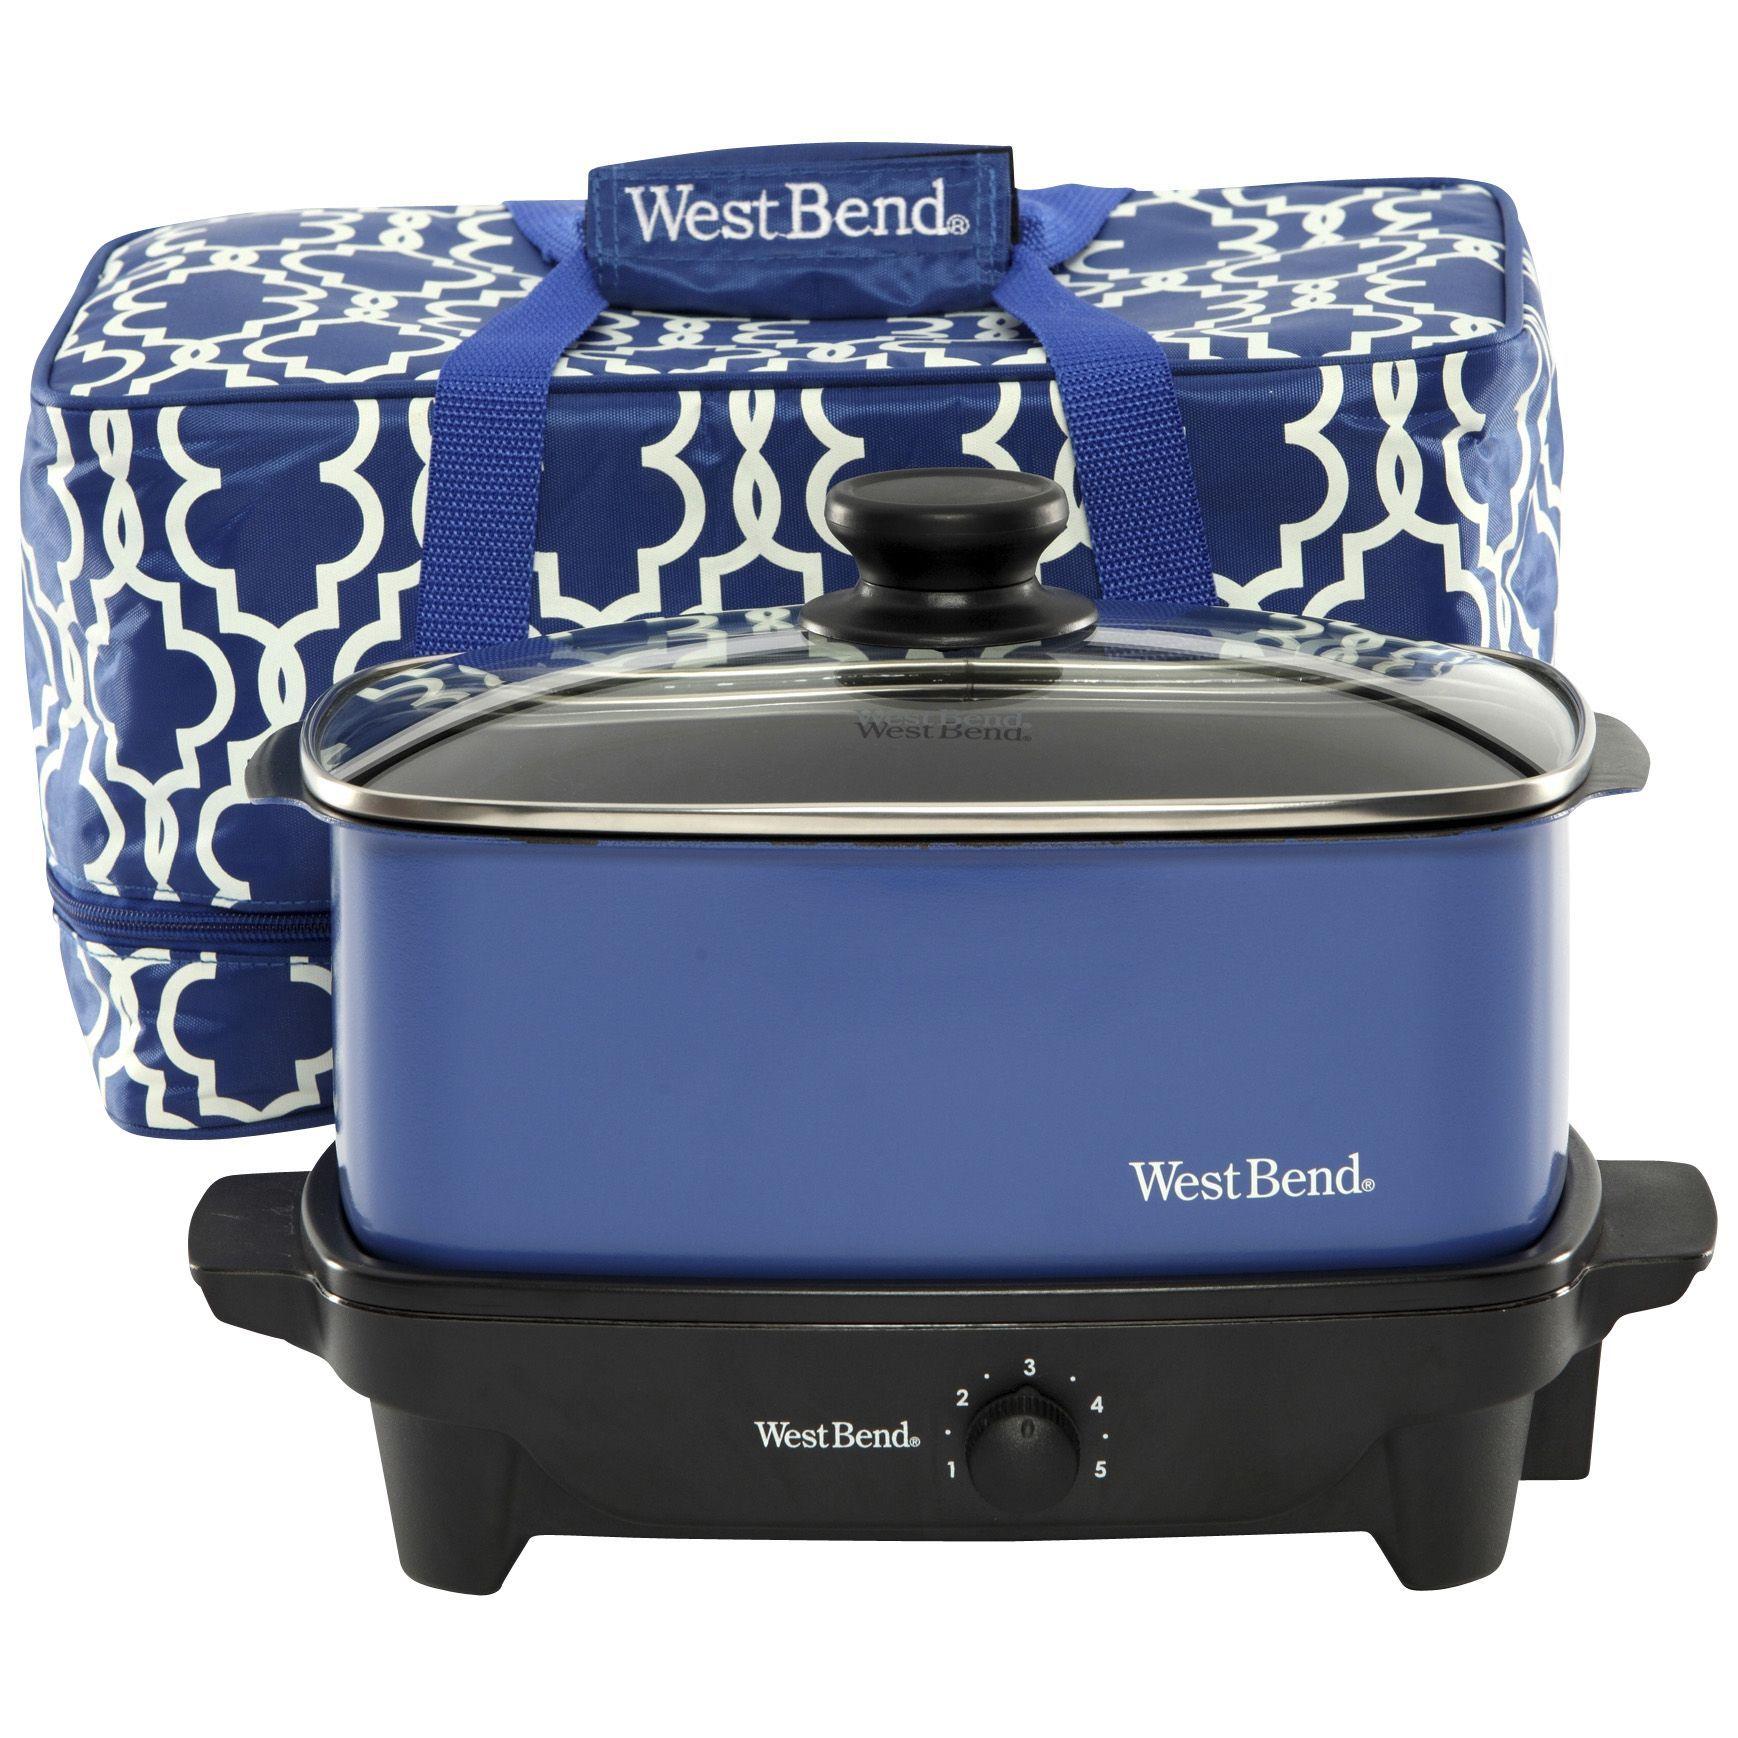 Fingerhut West Bend 5qt Slow Cooker w/ Insulated Travel